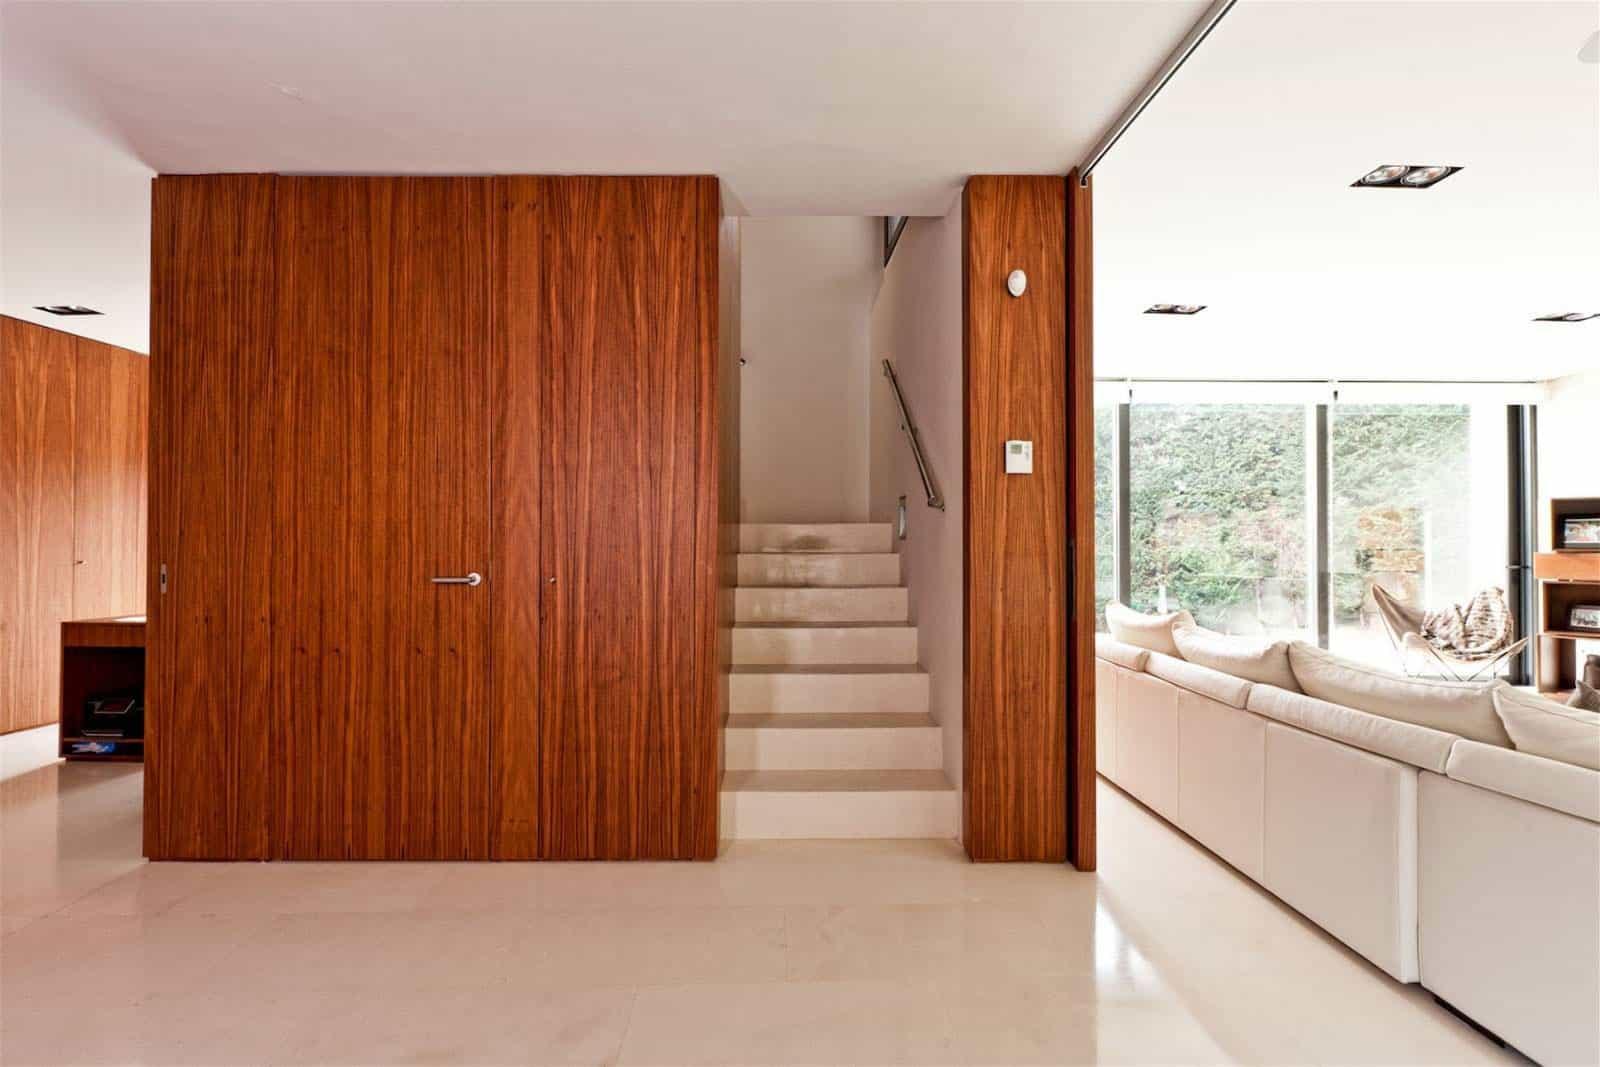 House Rehabilitation in Cerdanyola del Vallès, Spain (4)